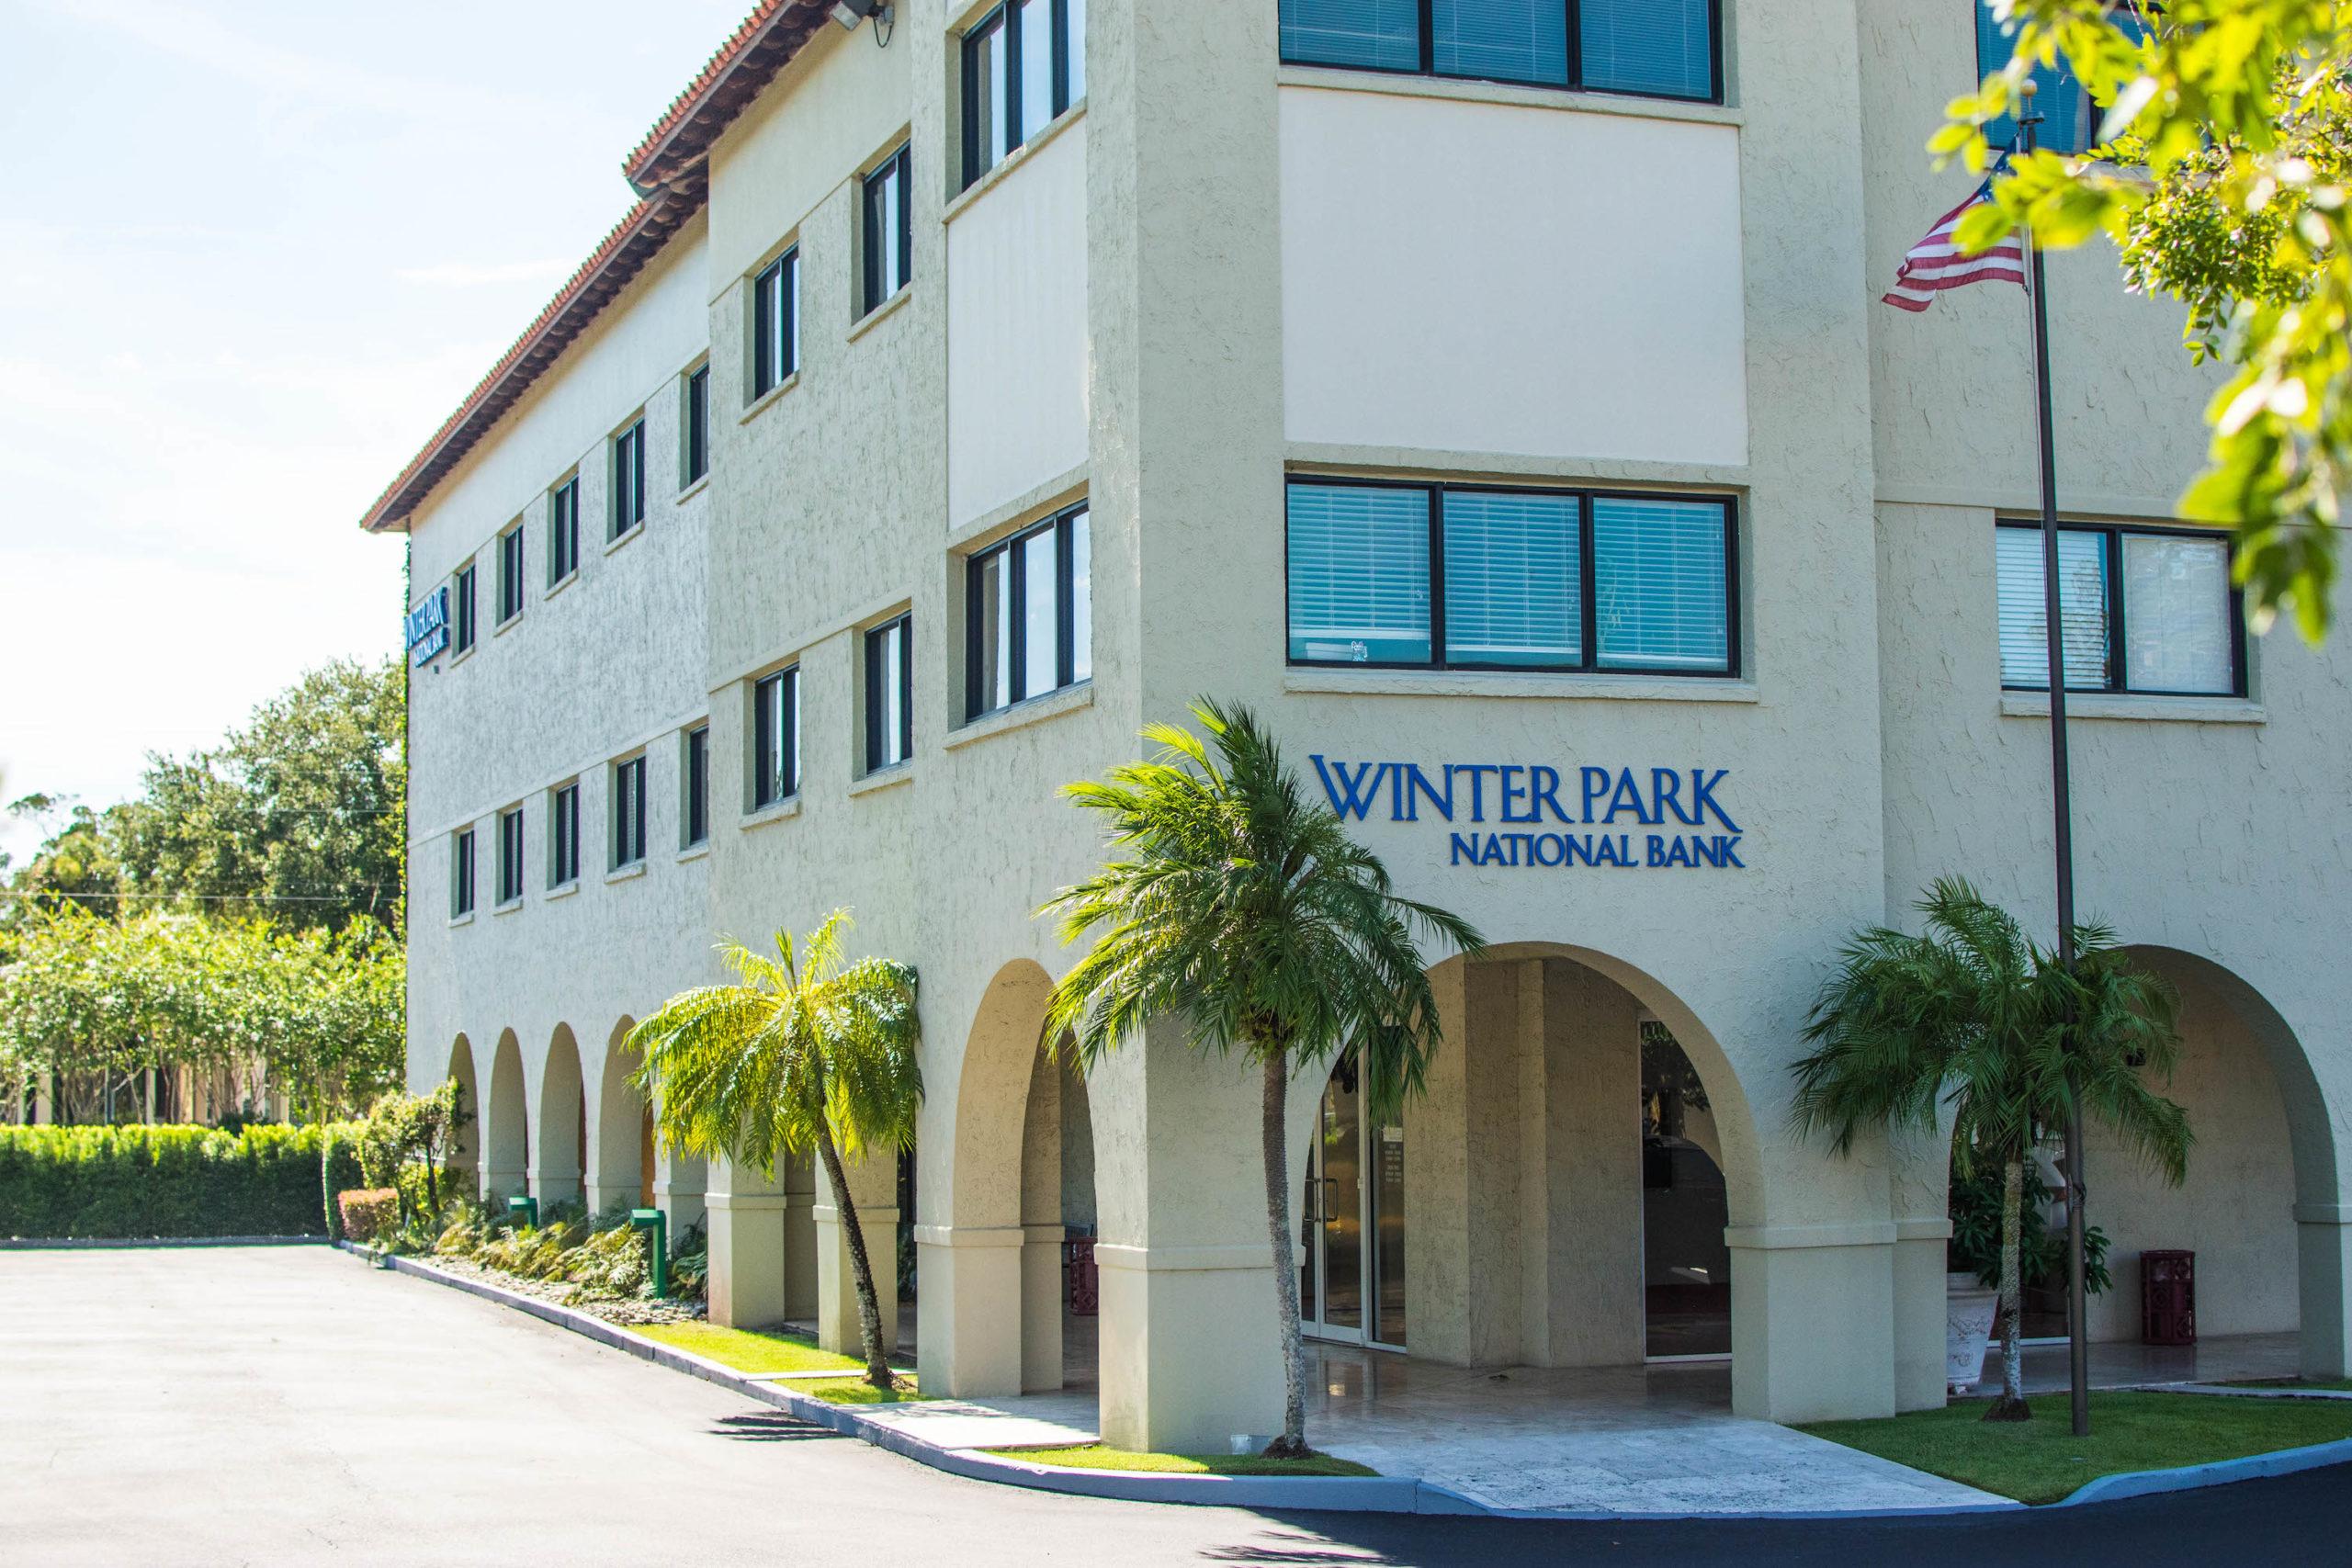 Winter Park National Bank office building.